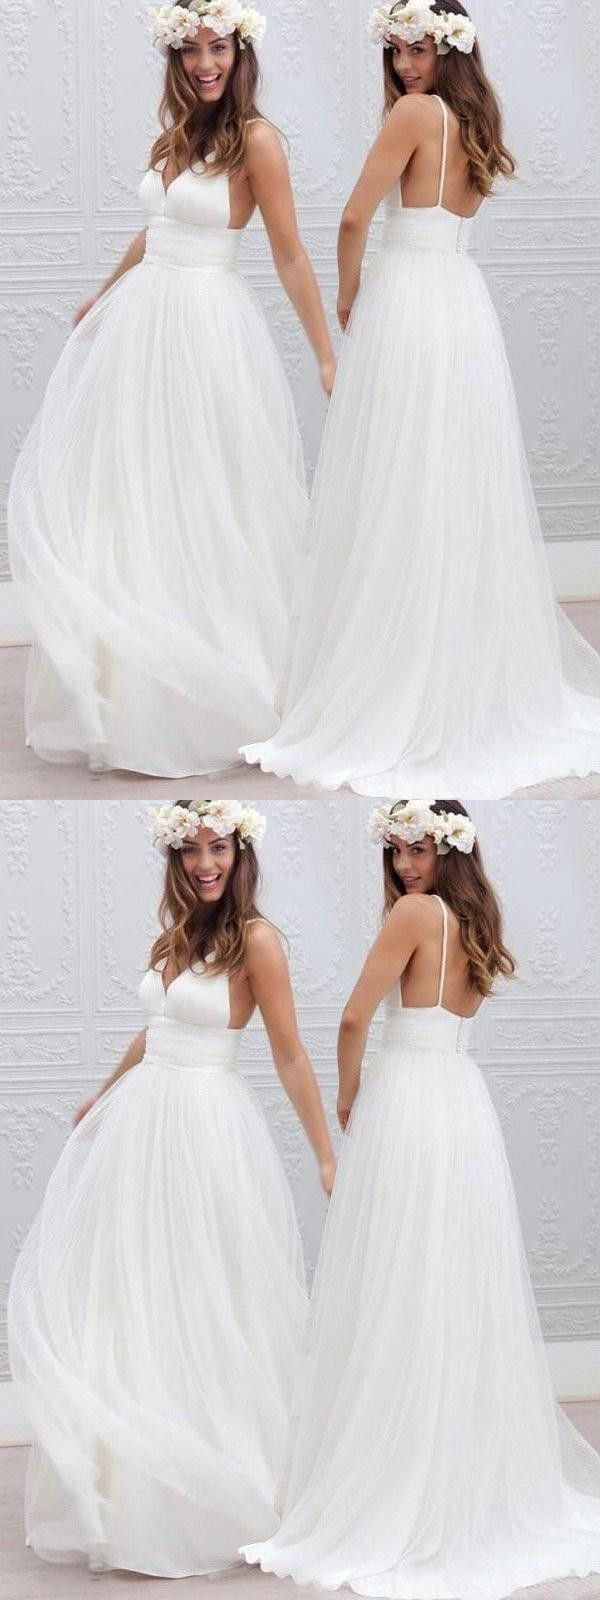 Chic Vintage Wedding Dress Ivory Cheap Wedding Dress # VB2233 ...